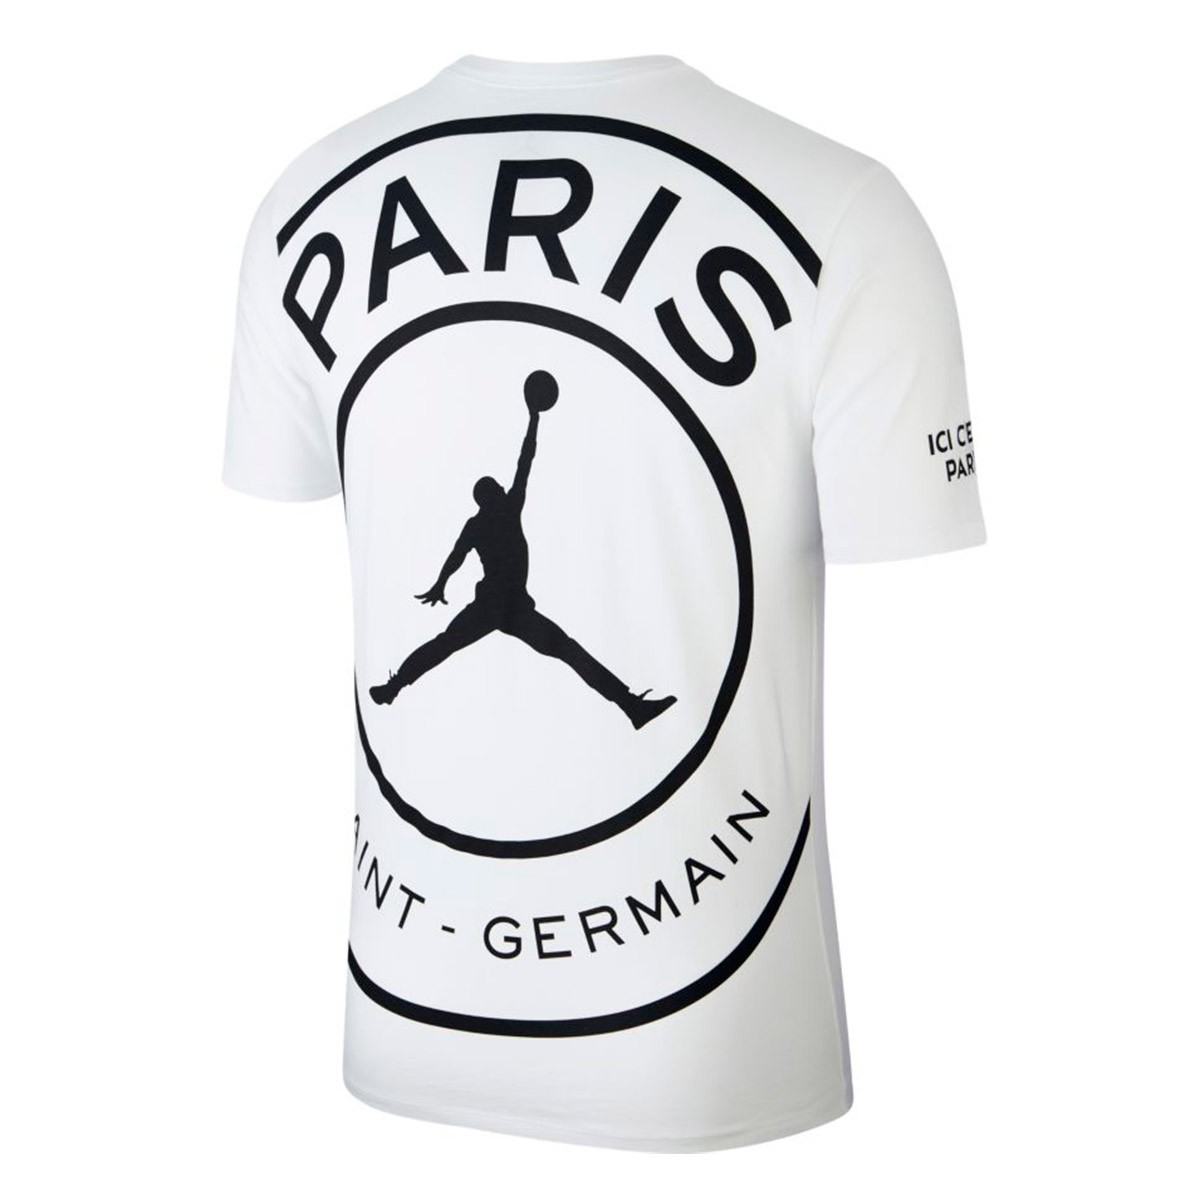 c820bc895ff3 ... Jersey Nike Jordan x PSG Logo White Black Tienda de f tbol F tbol